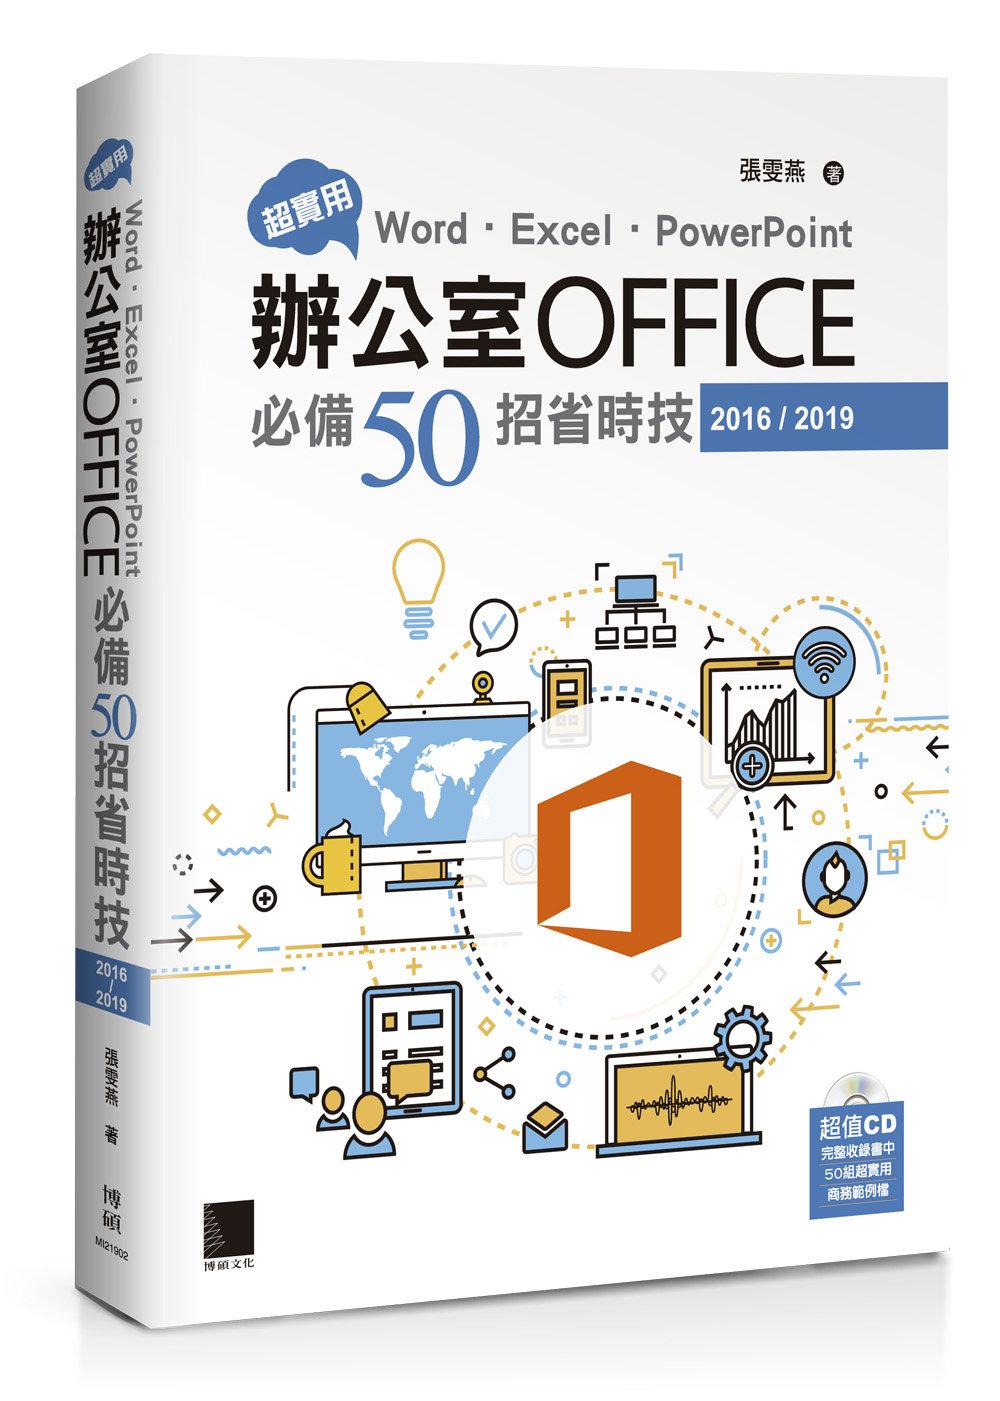 超實用!Word.Excel.PowerPoint 辦公室 Office 必備 50招省時技 (2016/2019)-preview-1